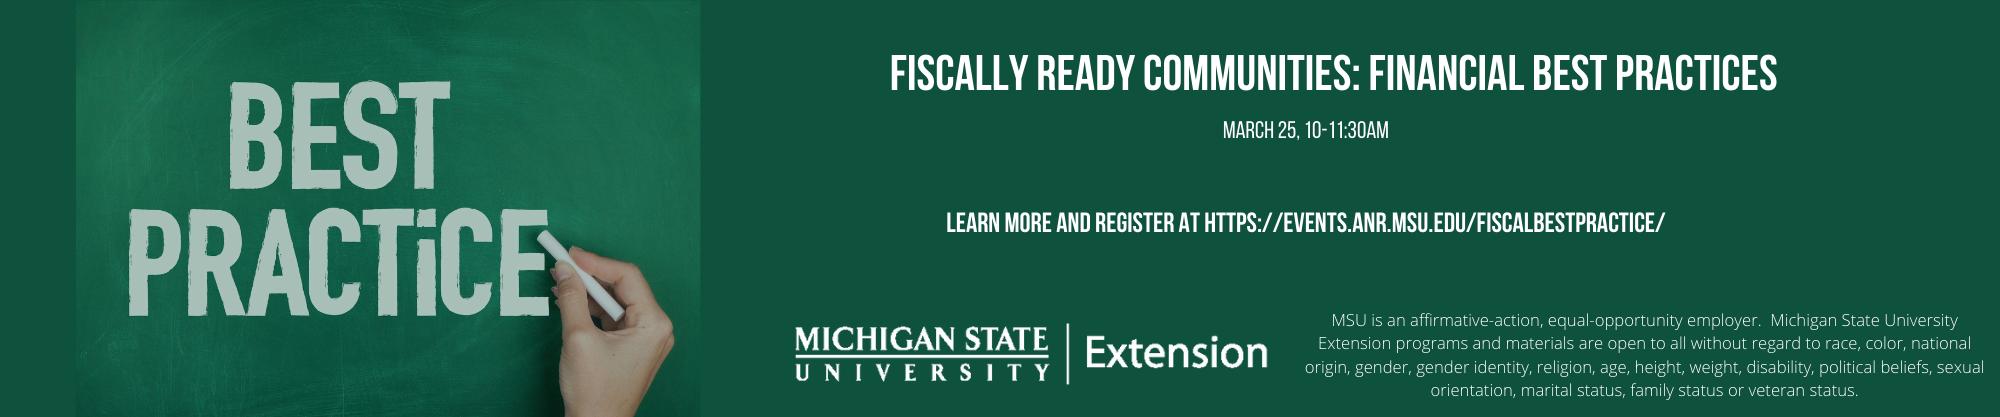 Fiscally responsible logo.